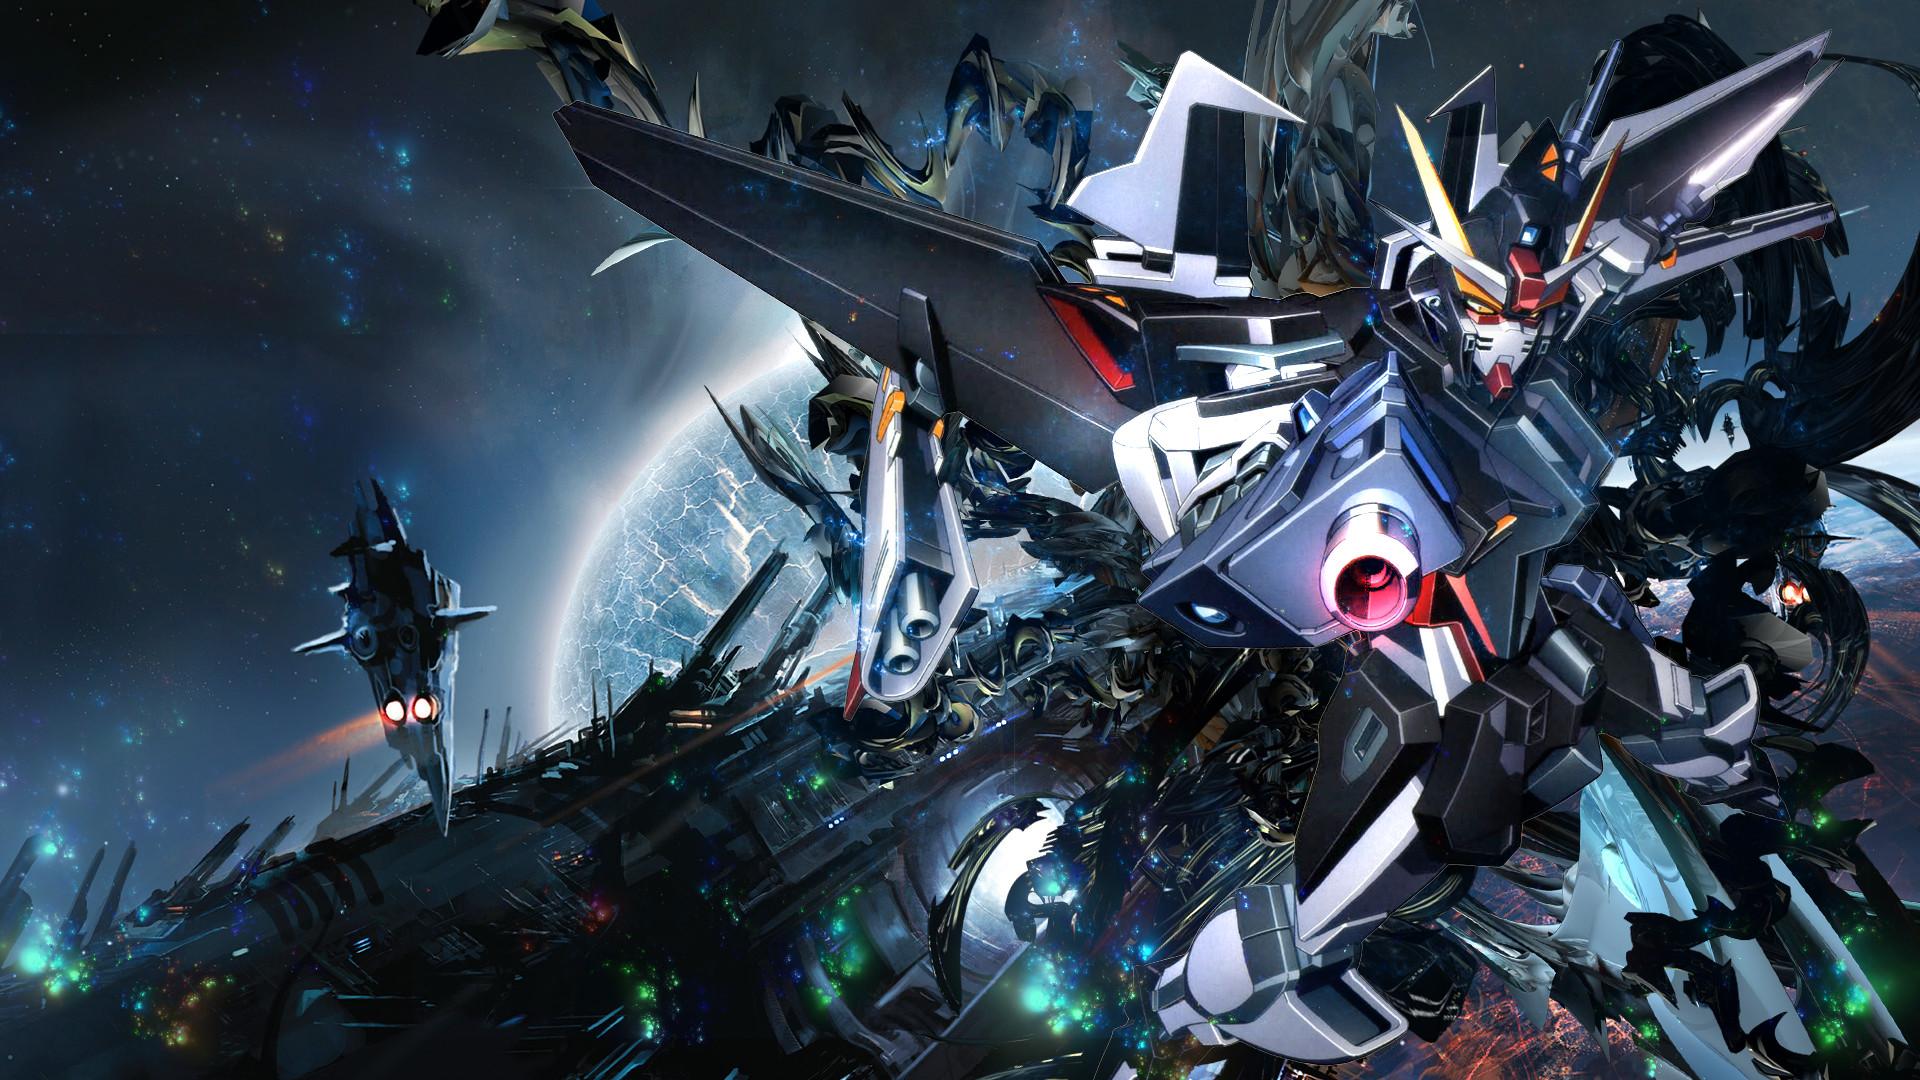 61 Gundam Wing Wallpapers on WallpaperPlay 1920x1080